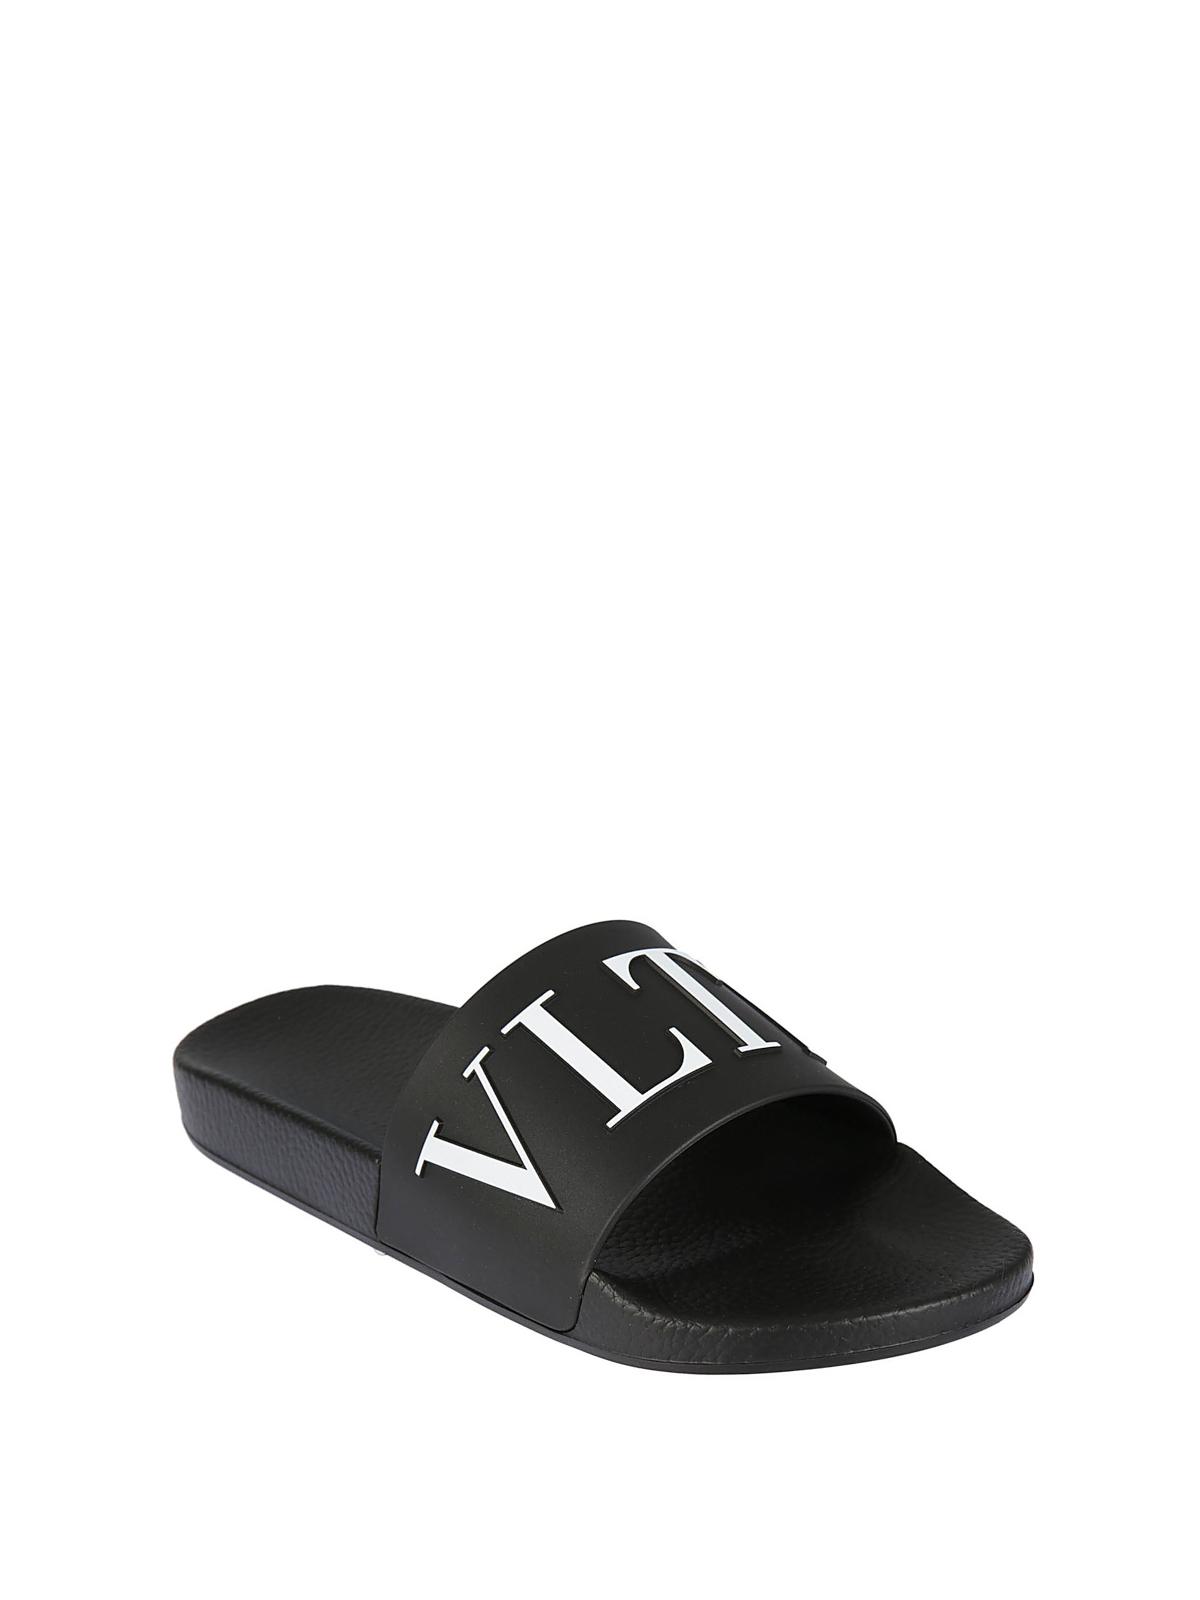 c4e79b9eb8a Valentino Garavani - VLTN black pool sliders - sandals - PY0S0873SYE0NI